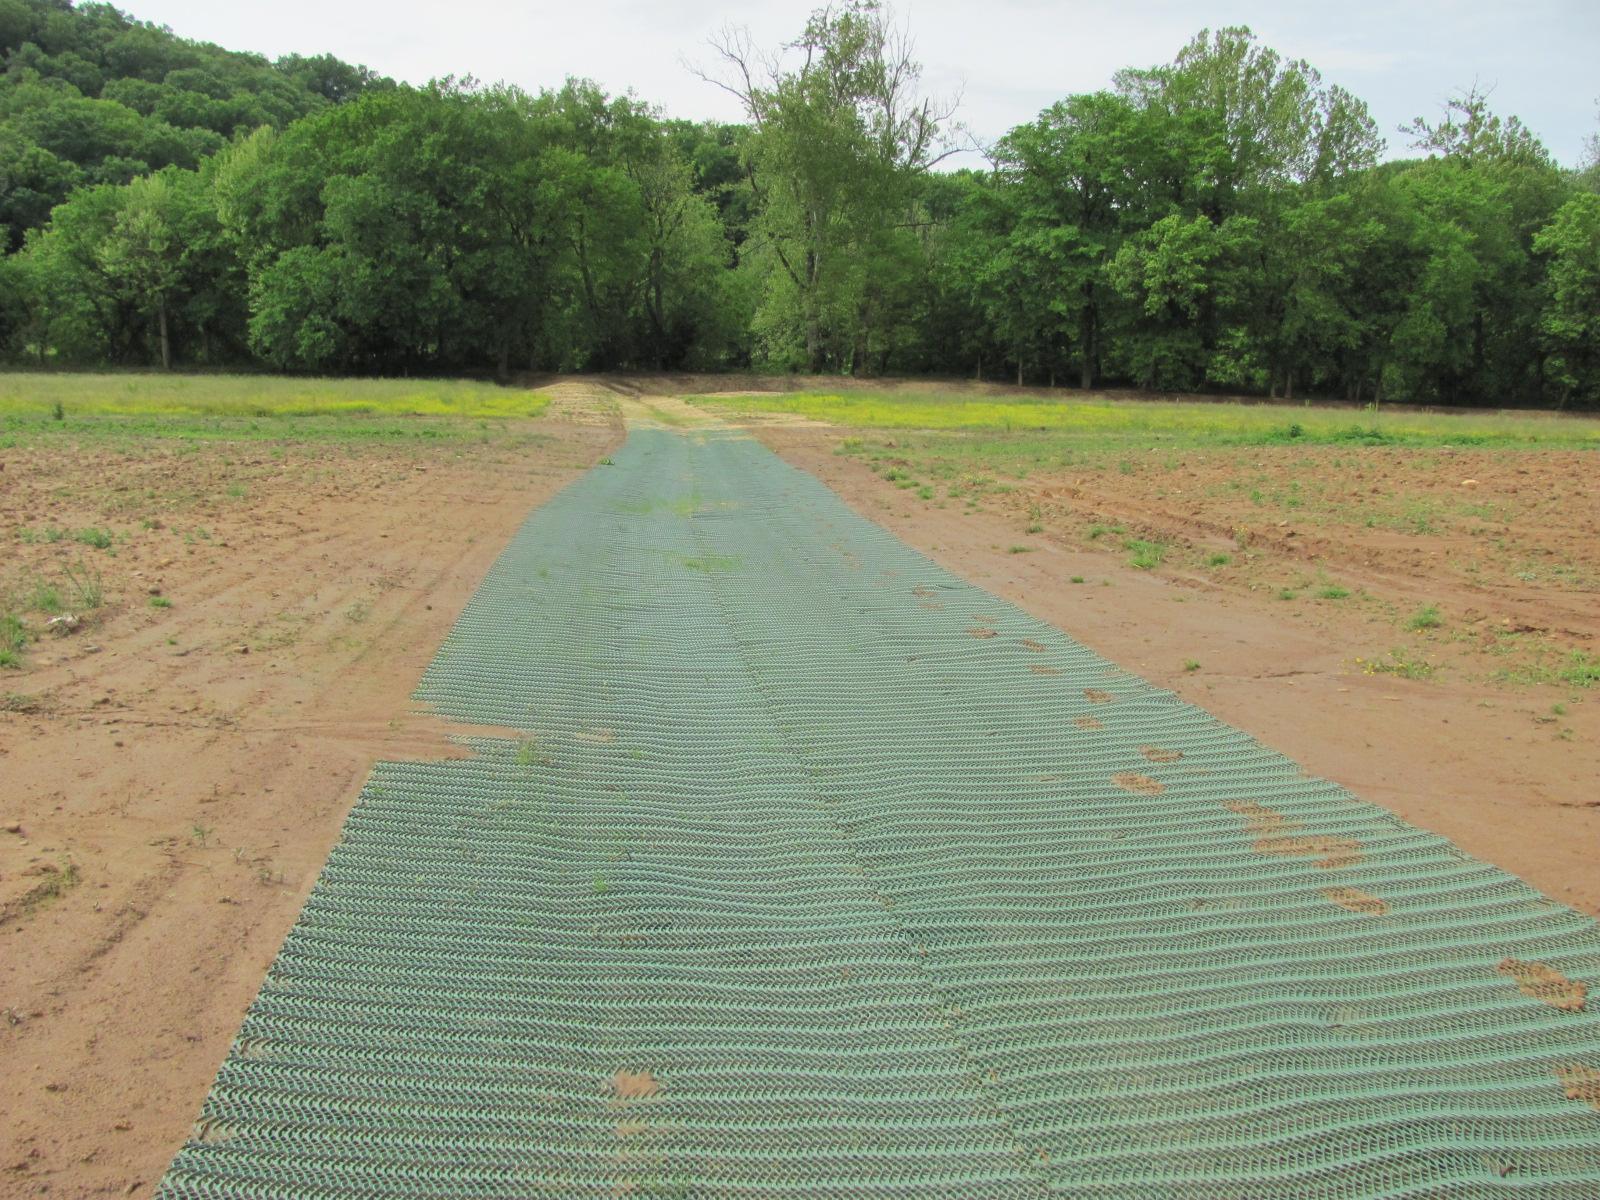 Shelton Farms Sediment Management Project, Reinforced Waterways, Hamblen County, TN